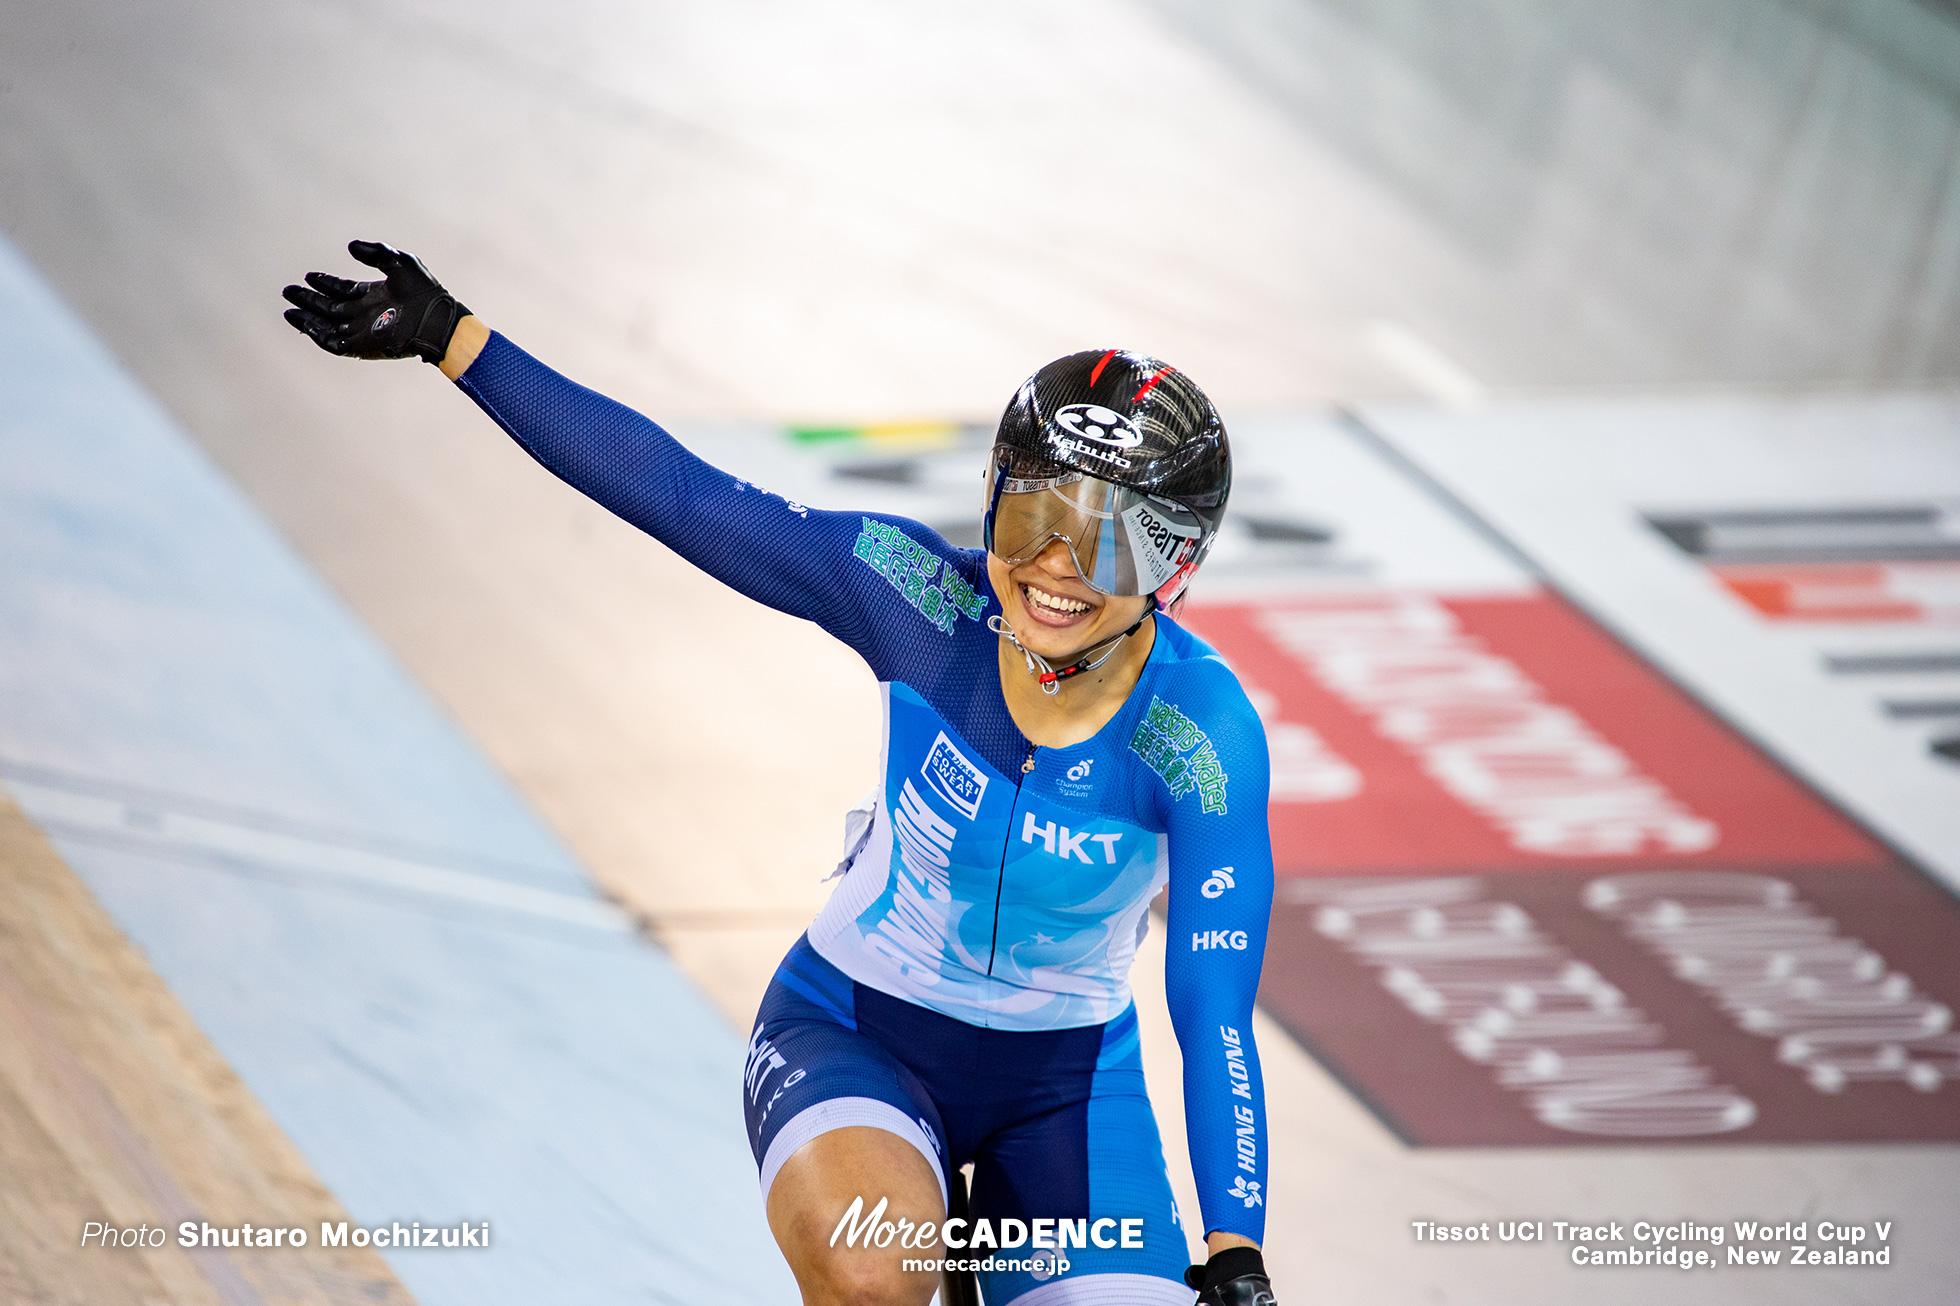 Lee Wai Sze / Final / Women's Keirin / Track Cycling World Cup V / Cambridge, New Zealand